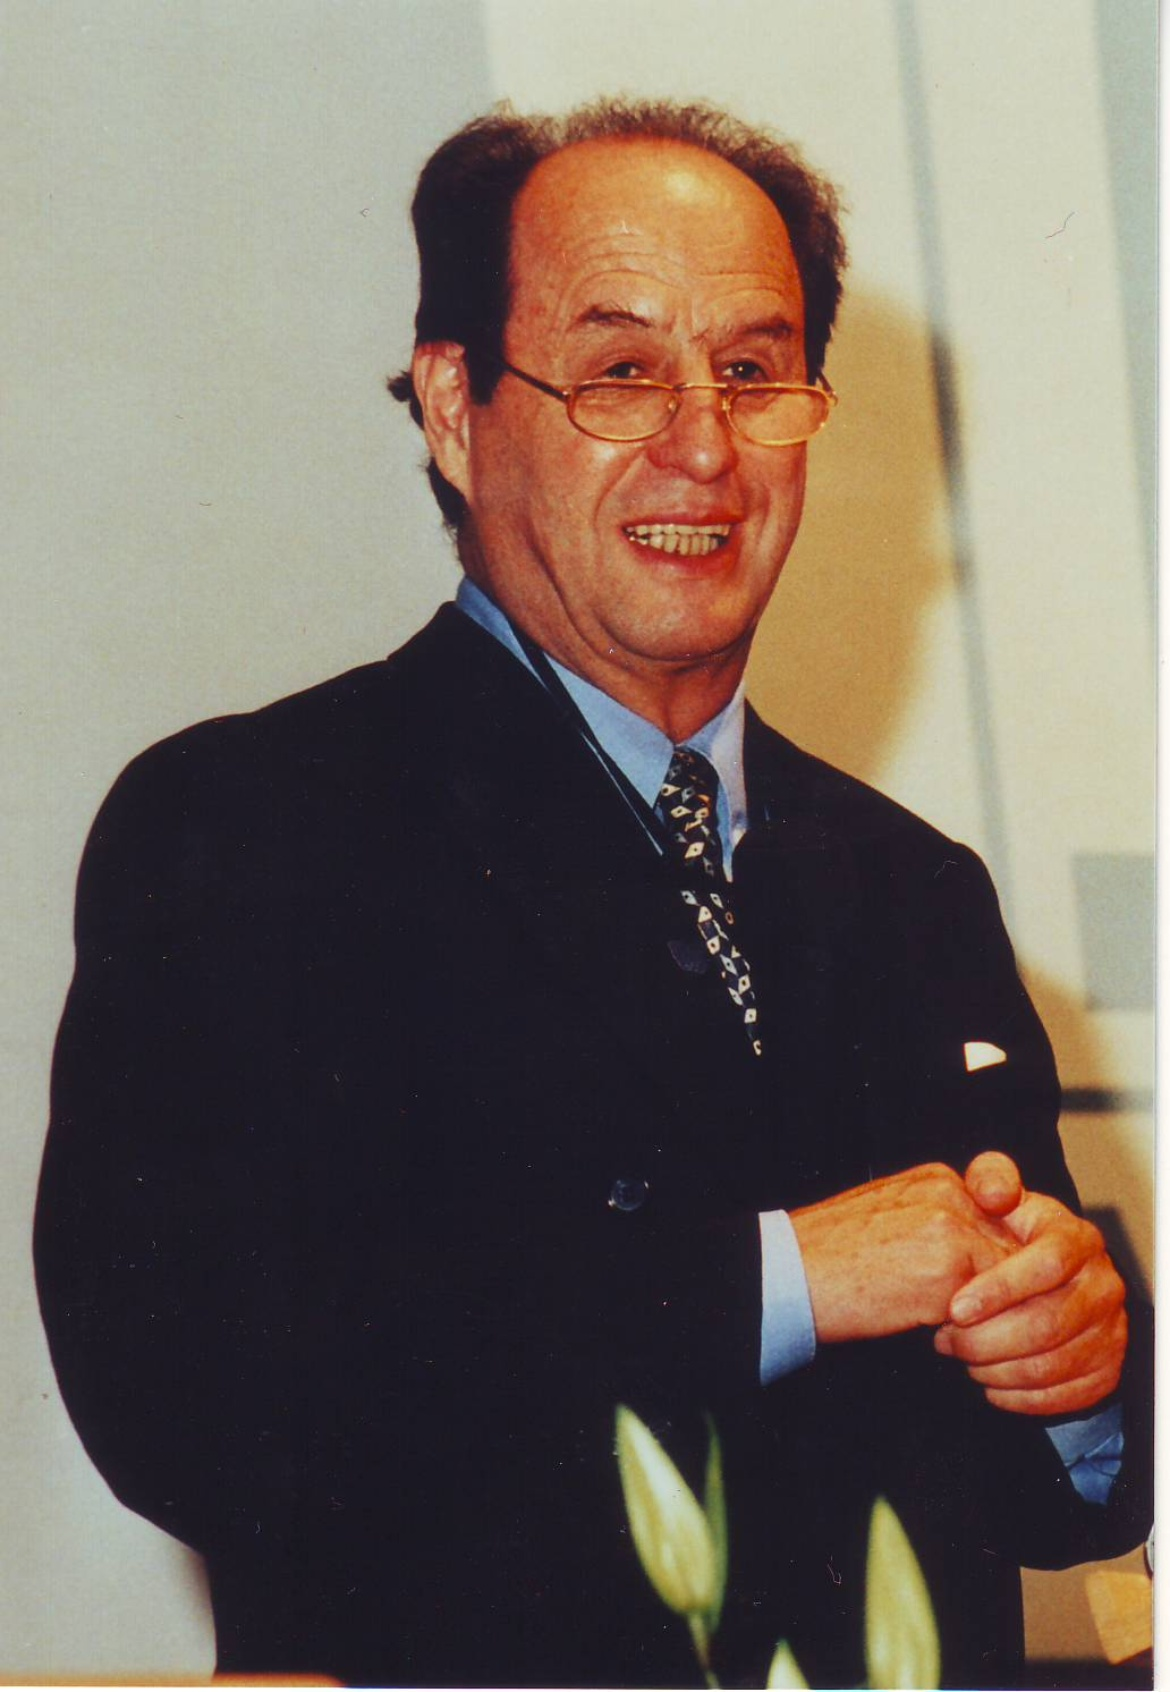 Prof. Horst Falkner (c) Falkner